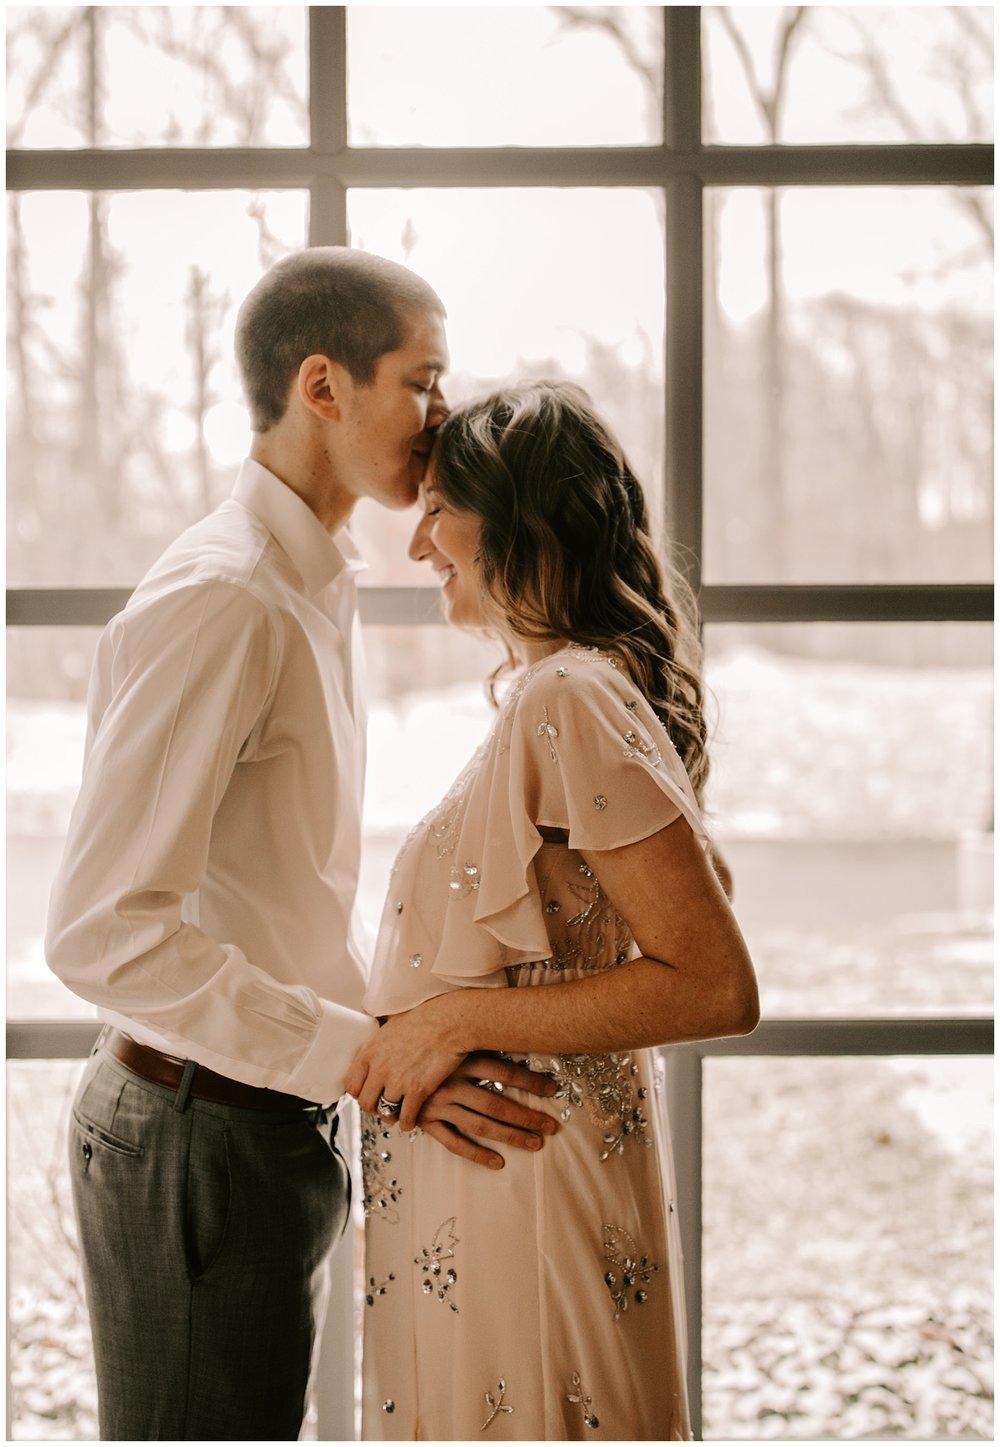 Becca+Grant-Maternity-45_WEB.jpg